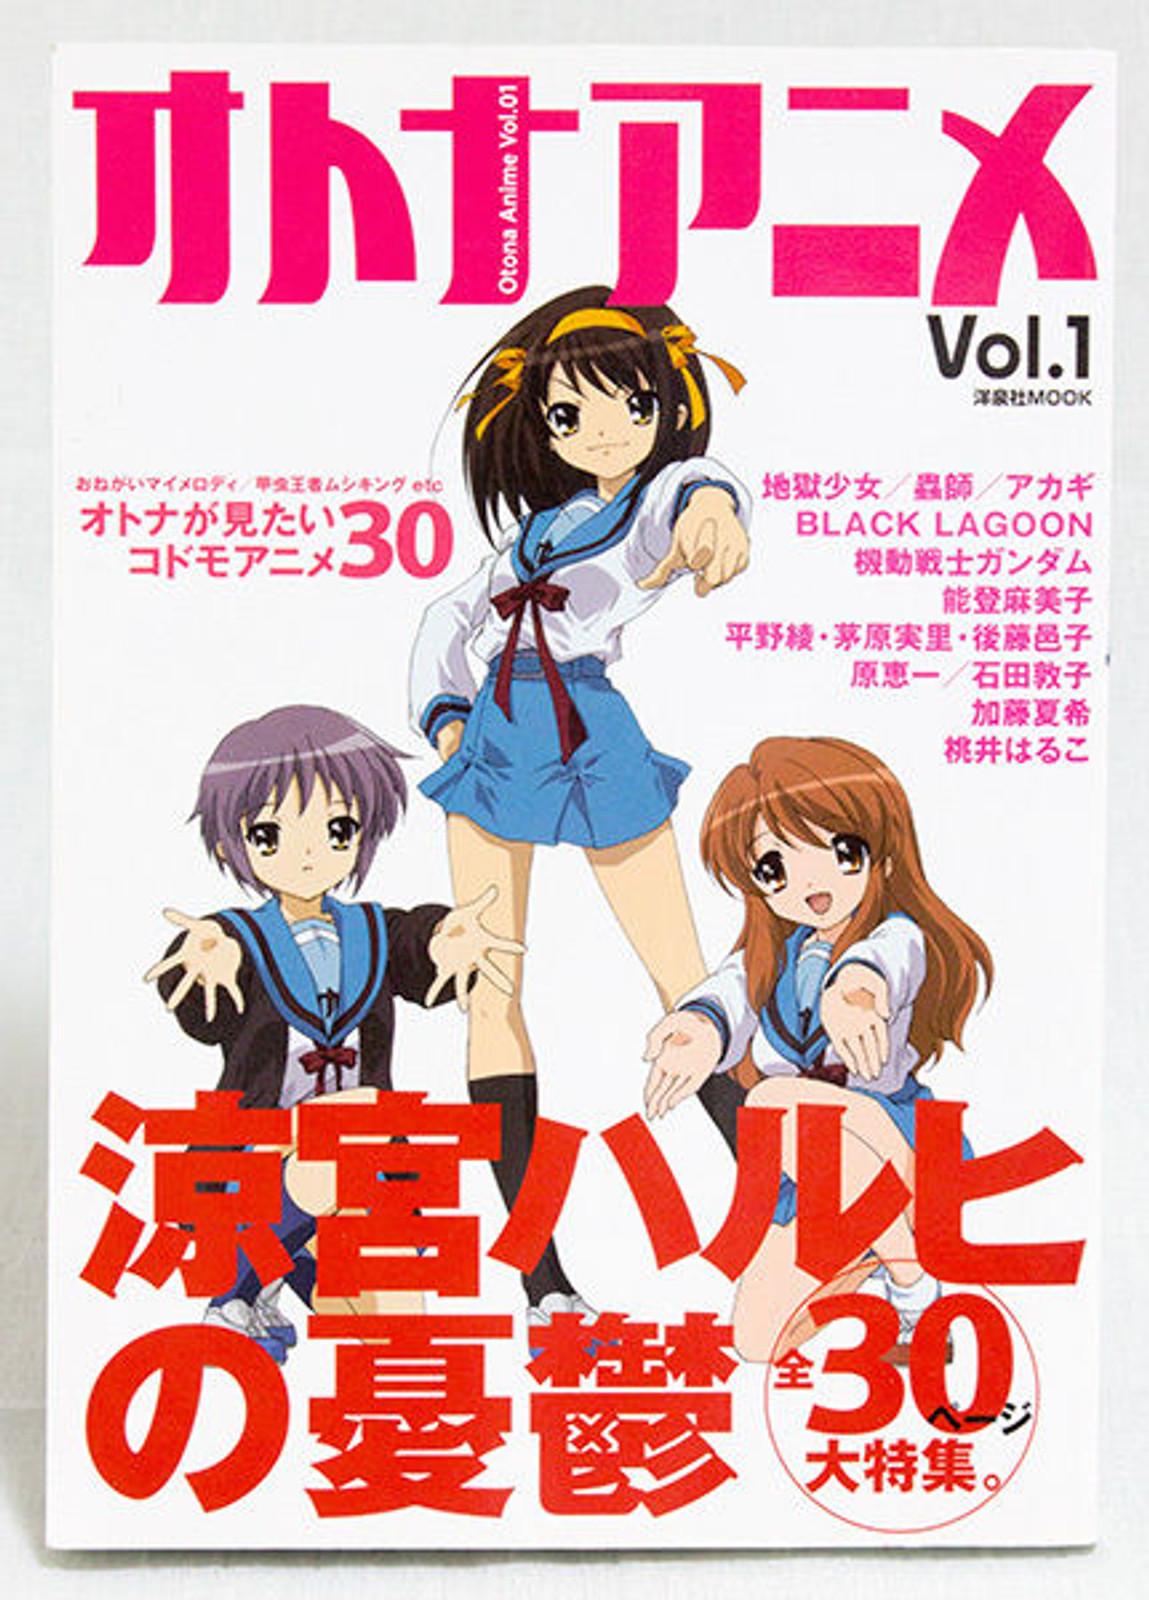 Otona Anime Vol.01 Japanese Magazine AUG/2006 JAPAN HARUHI SUZUMIYA ANIME MANGA